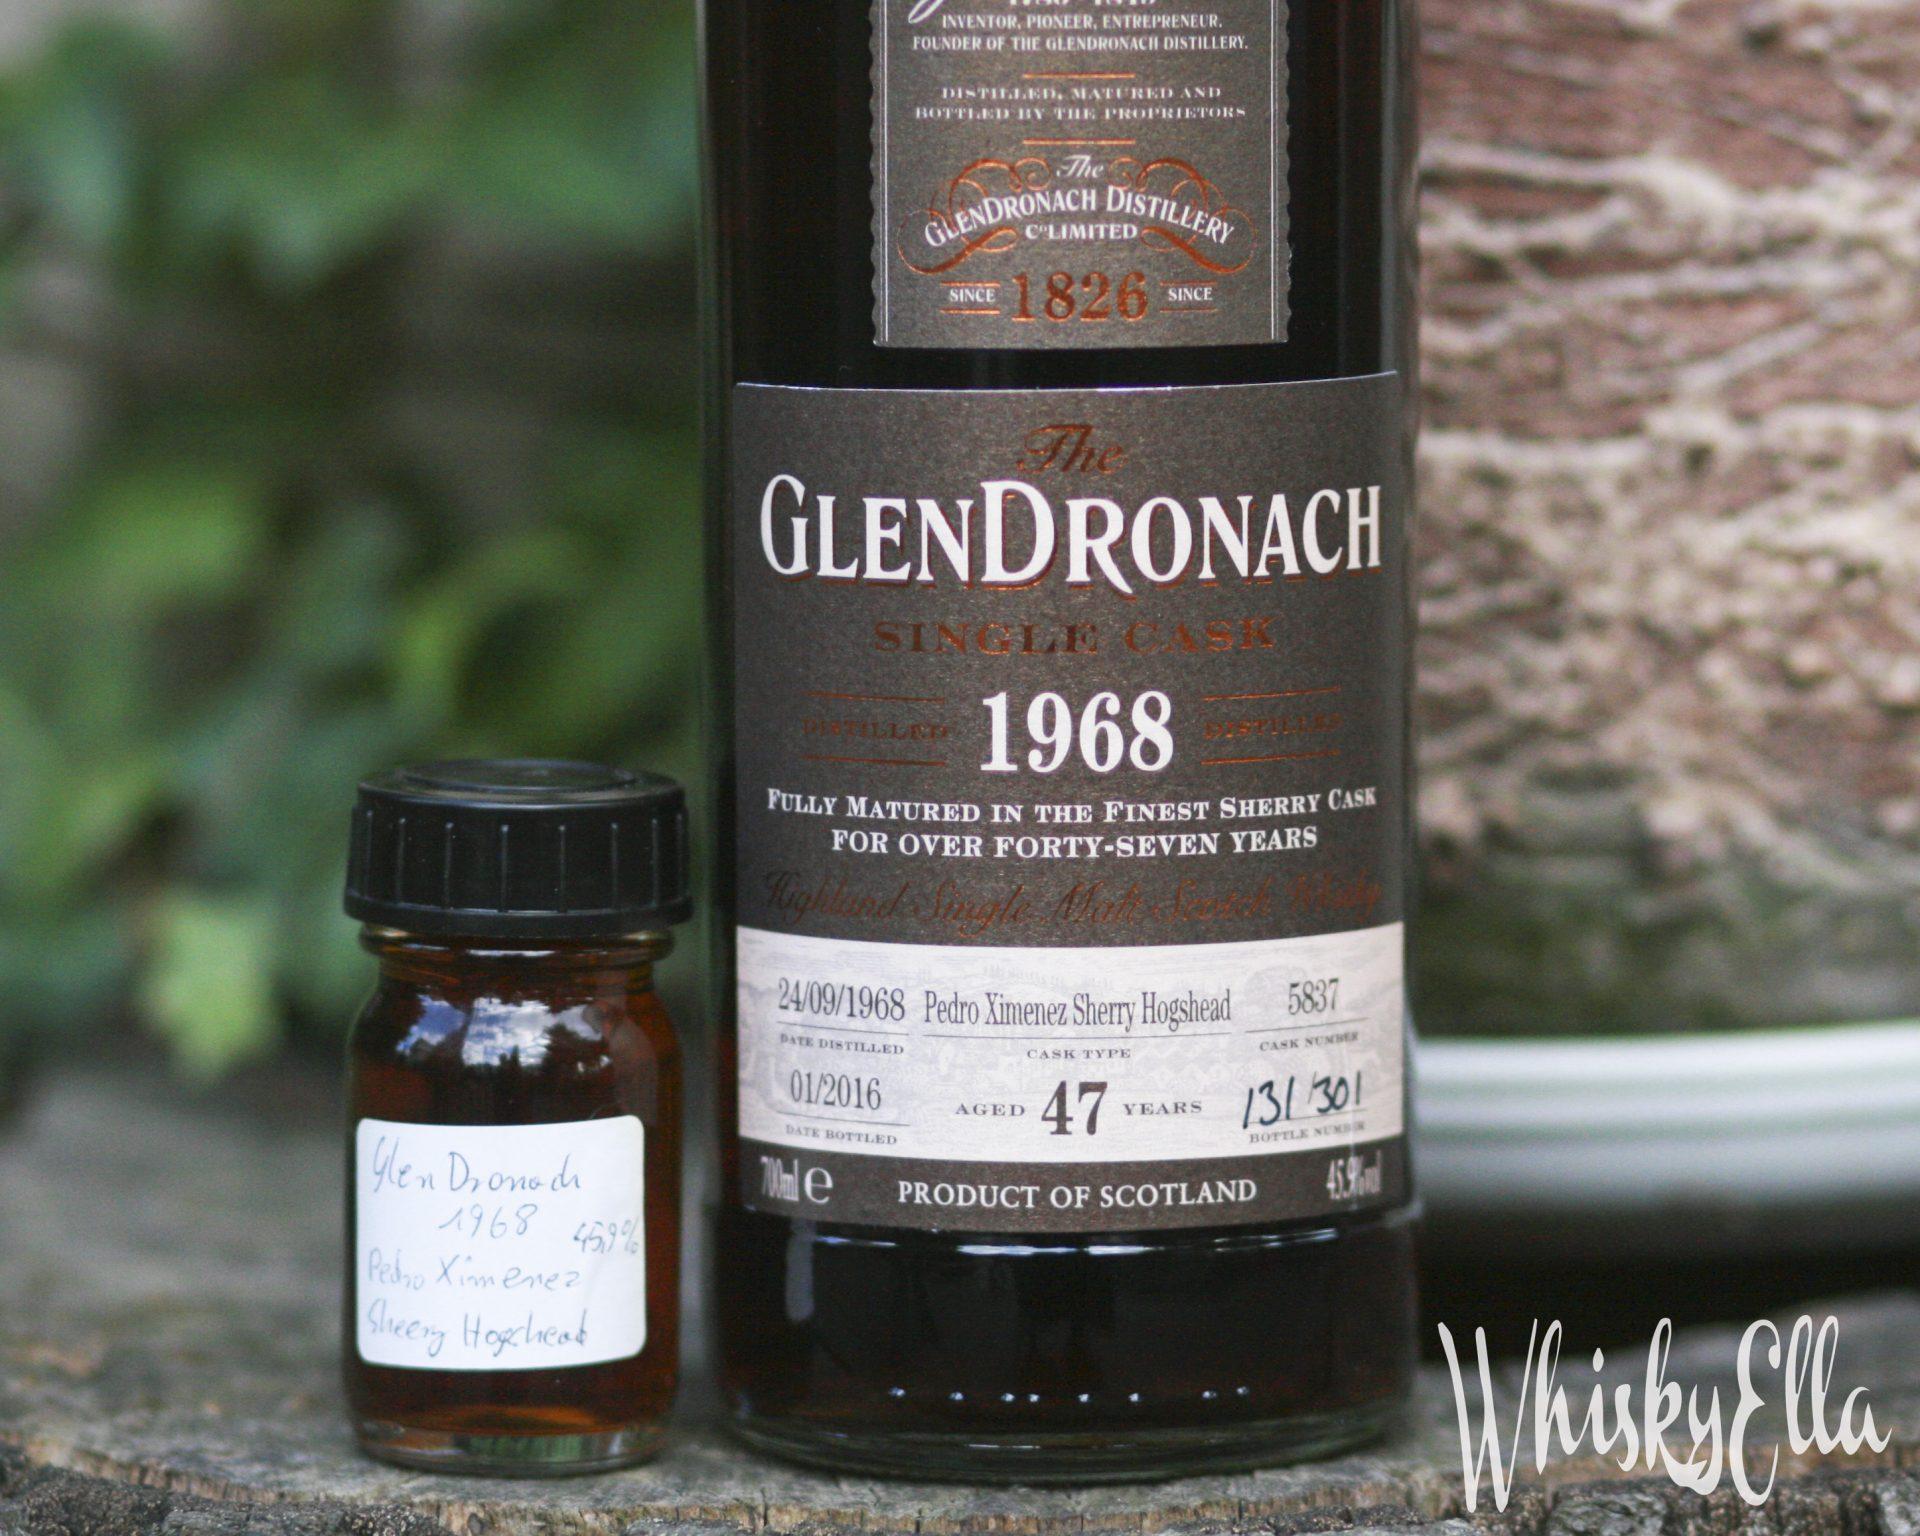 Nasza recenzja Glendronach 1968 47 yo  #100